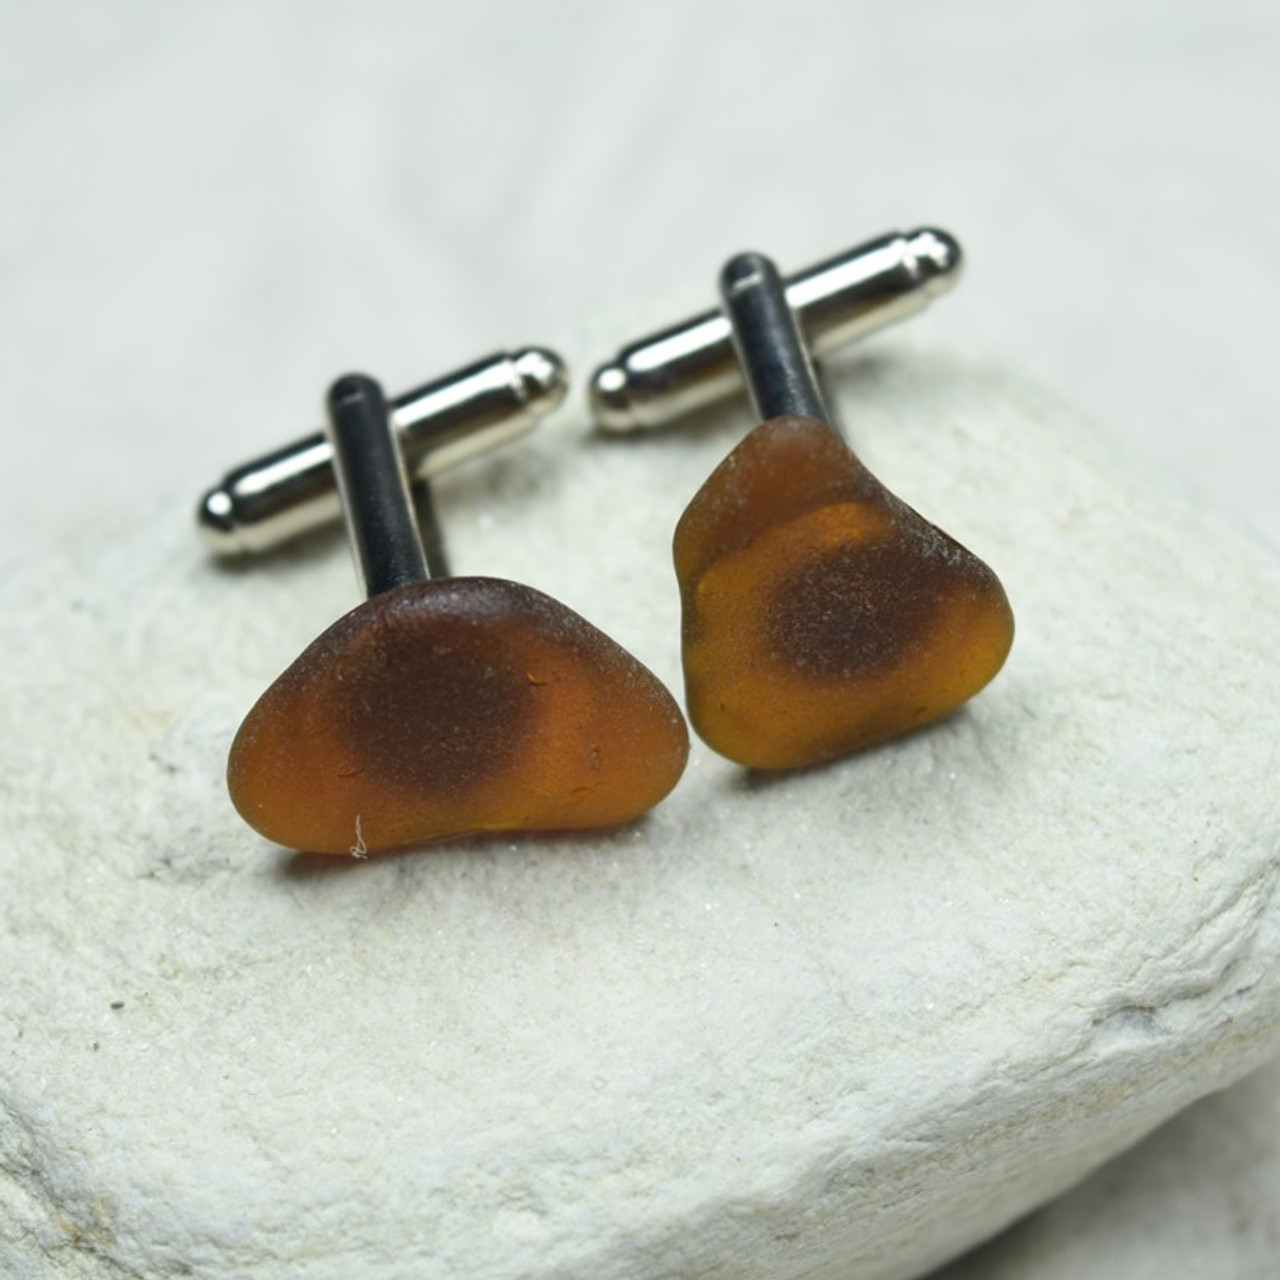 Brown Sea Glass Cufflinks Handmade - 1 Set - Made to Order